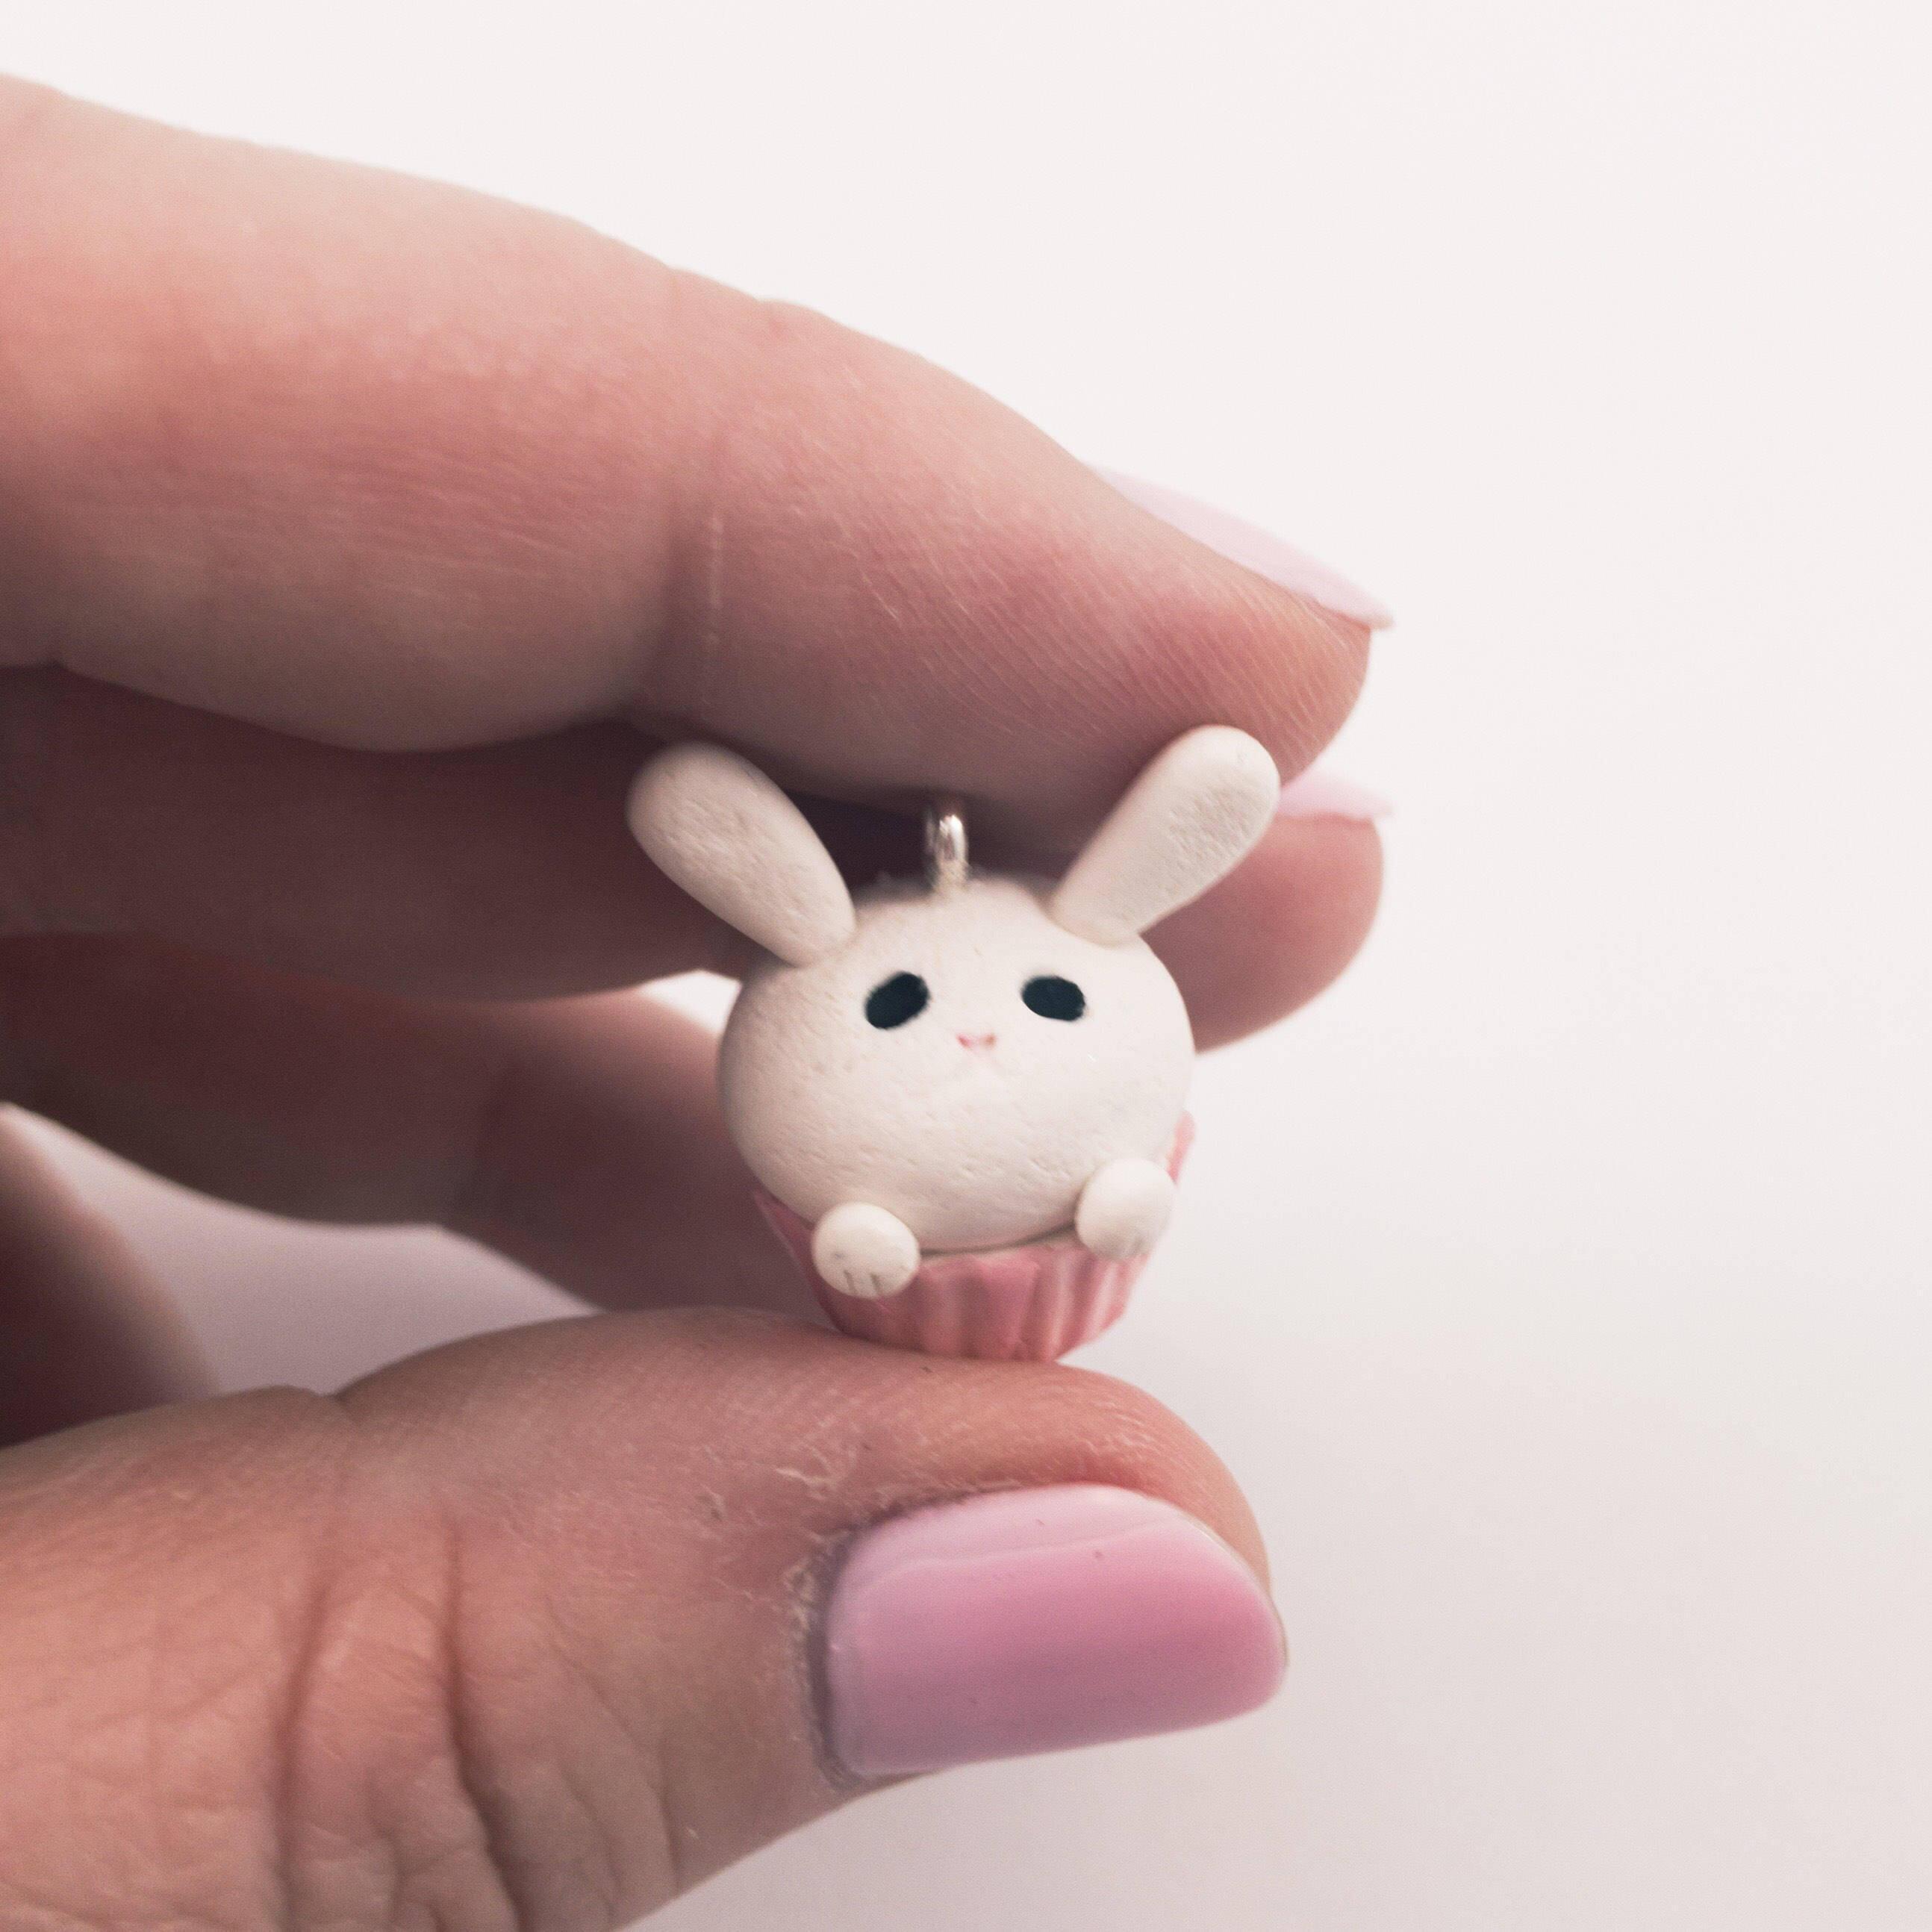 fireflyFrippery Miniature Perky Eared Bunny Cupcake in Hand